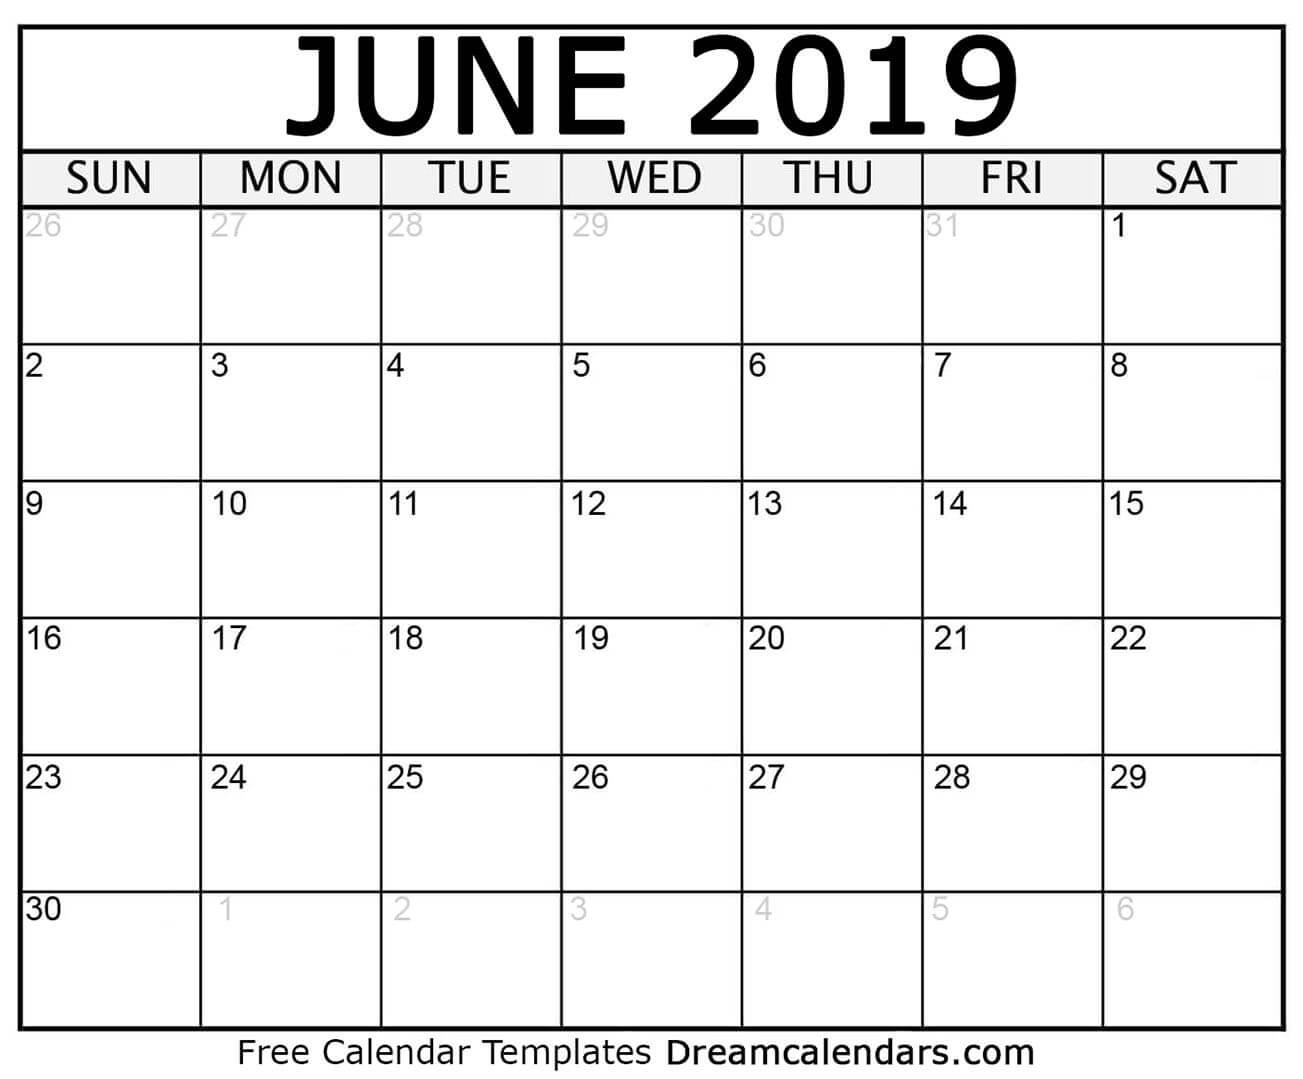 Printable June 2019 Calendar Dream Calendars